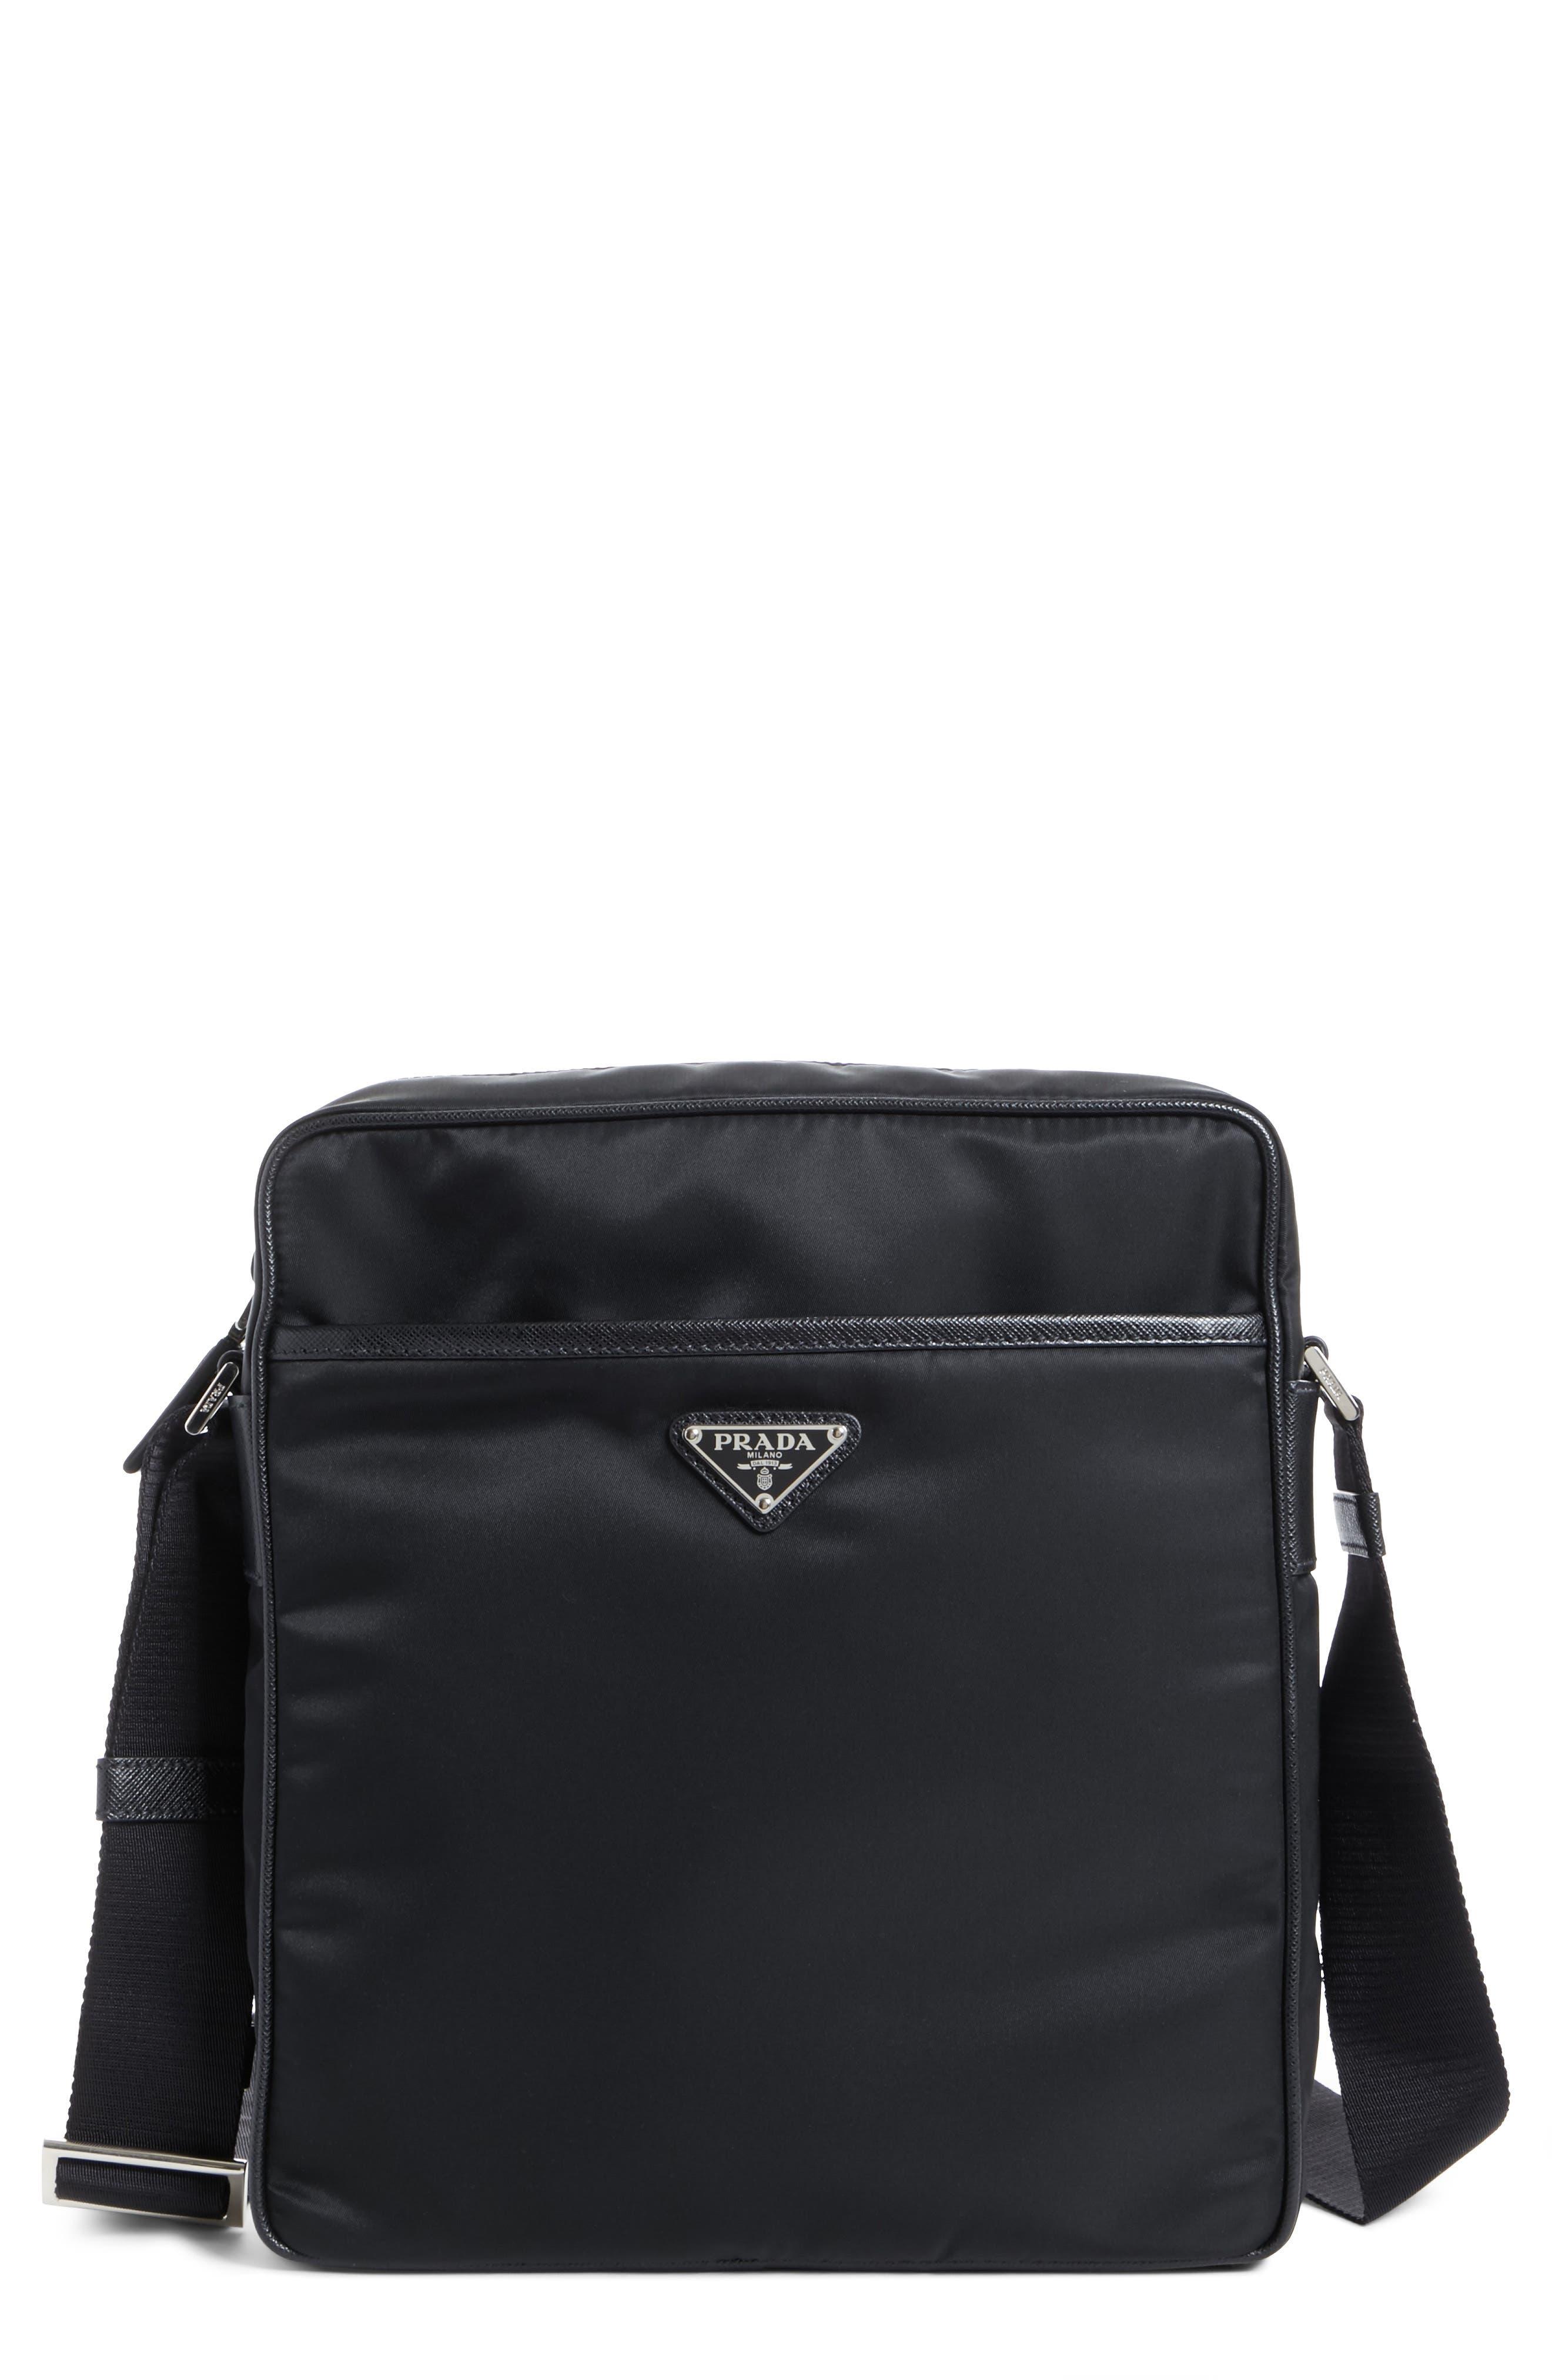 Saffiano Leather Crossbody Bag,                             Main thumbnail 1, color,                             001